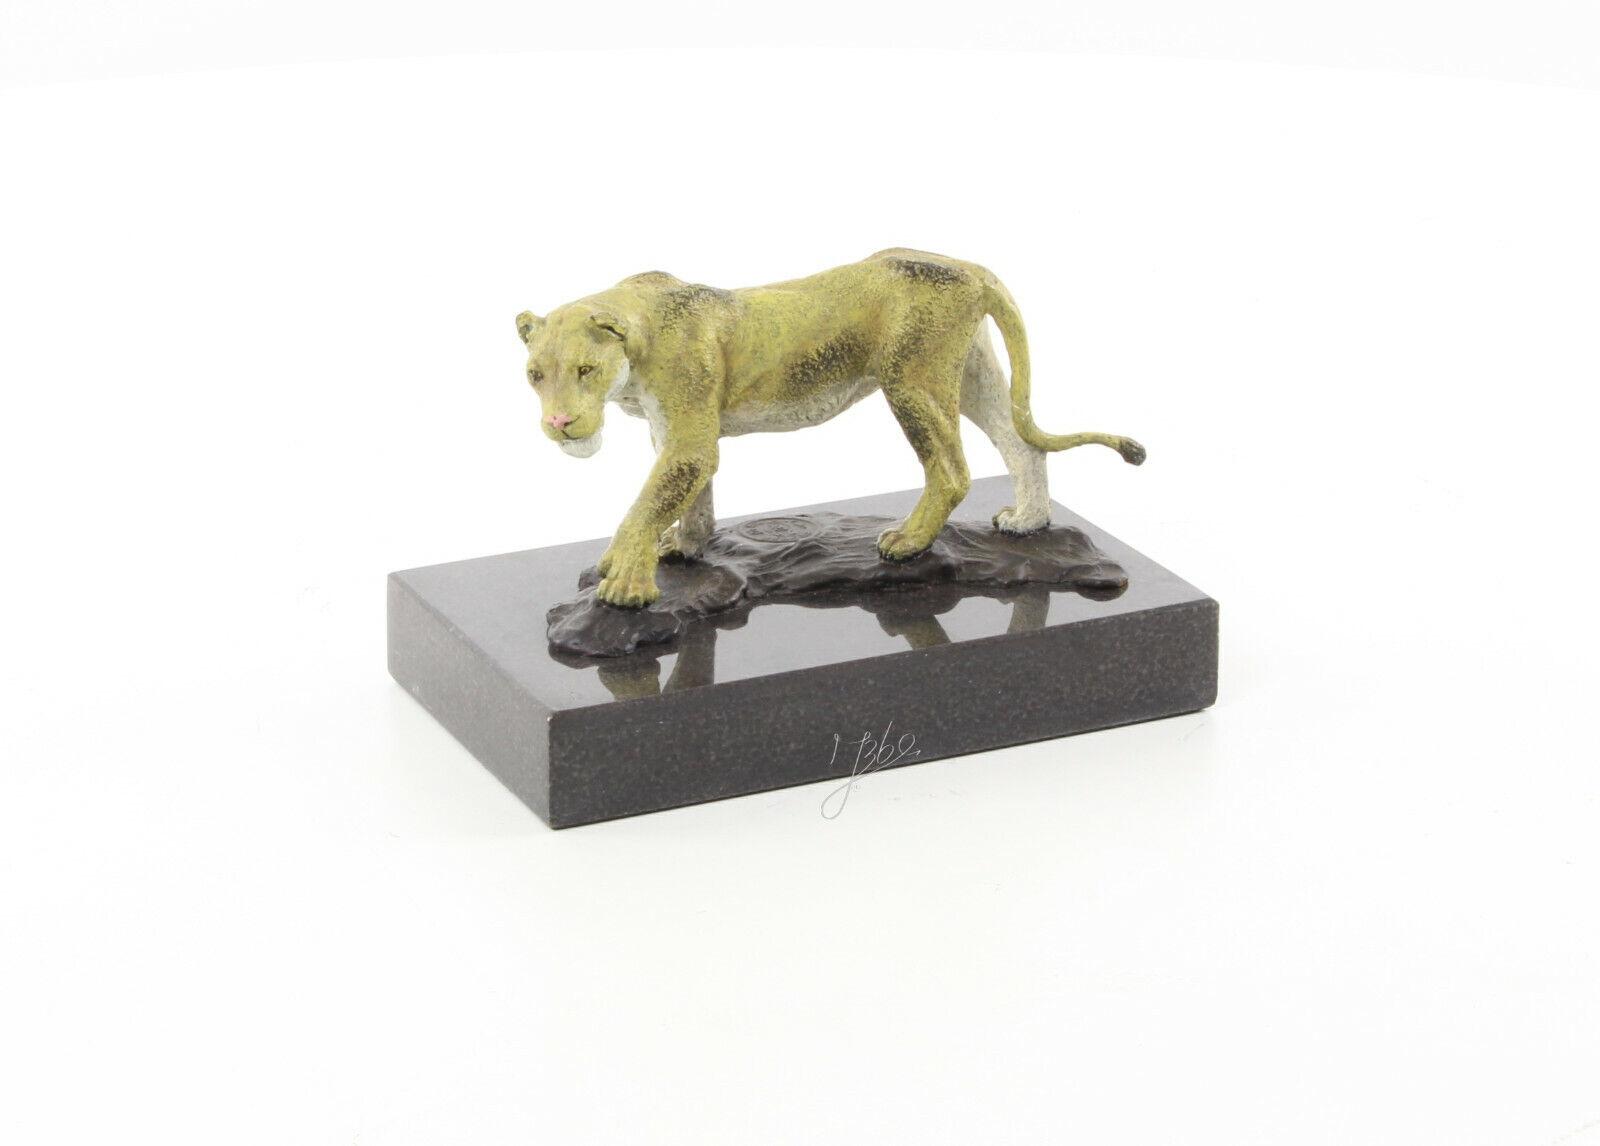 9973487-dss Bronze Skulptur Figur Löwin 8x8x13cm